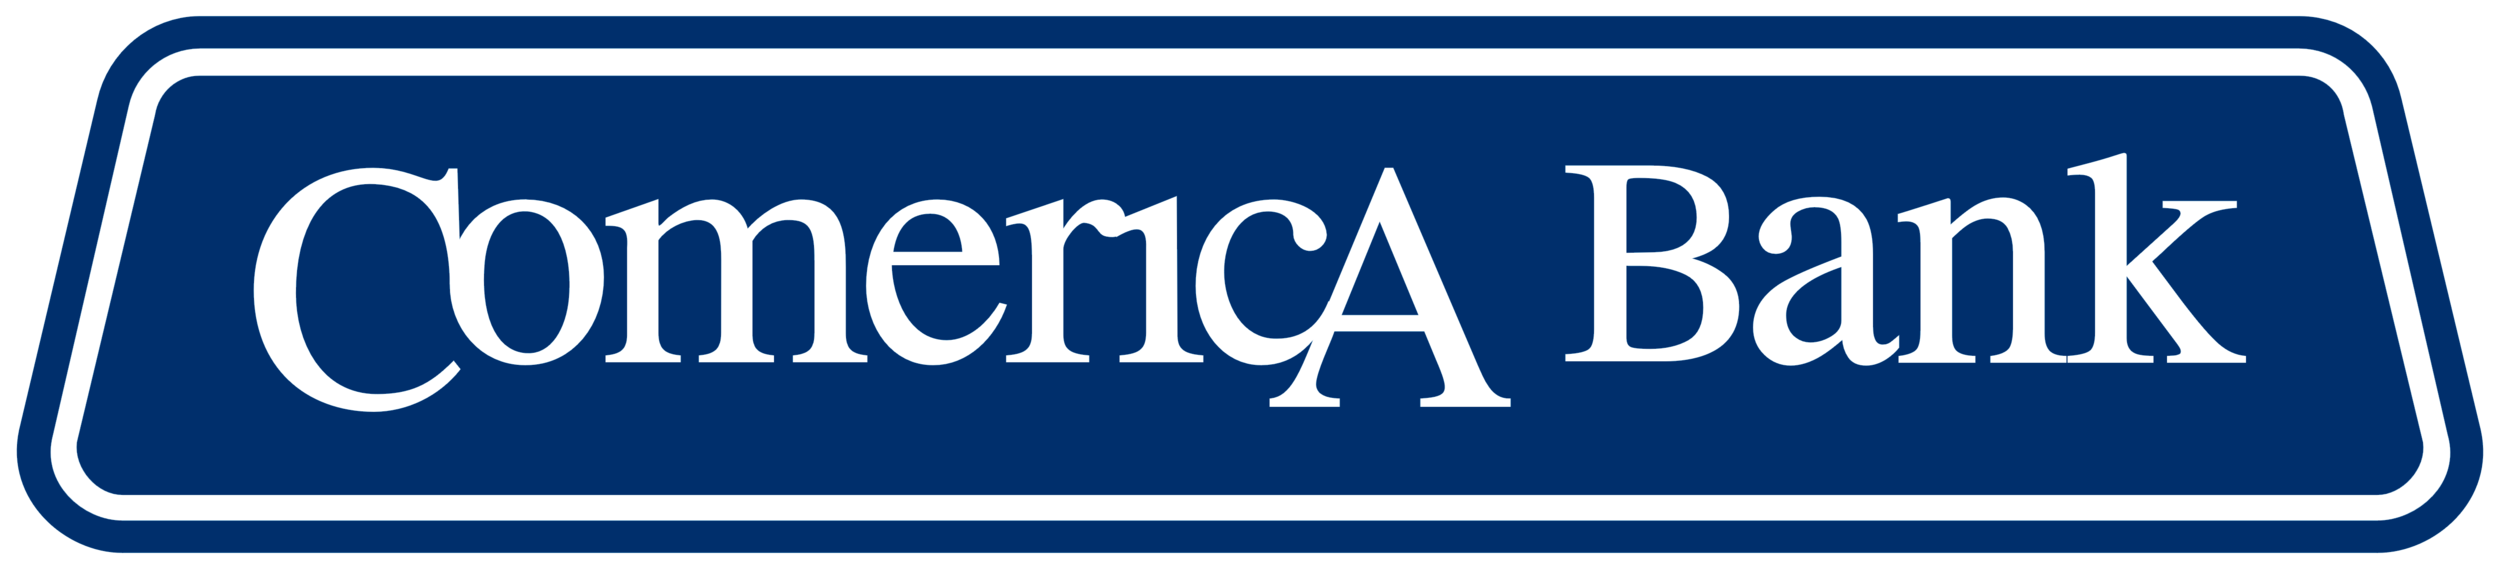 Comerica_Bank_logo.png